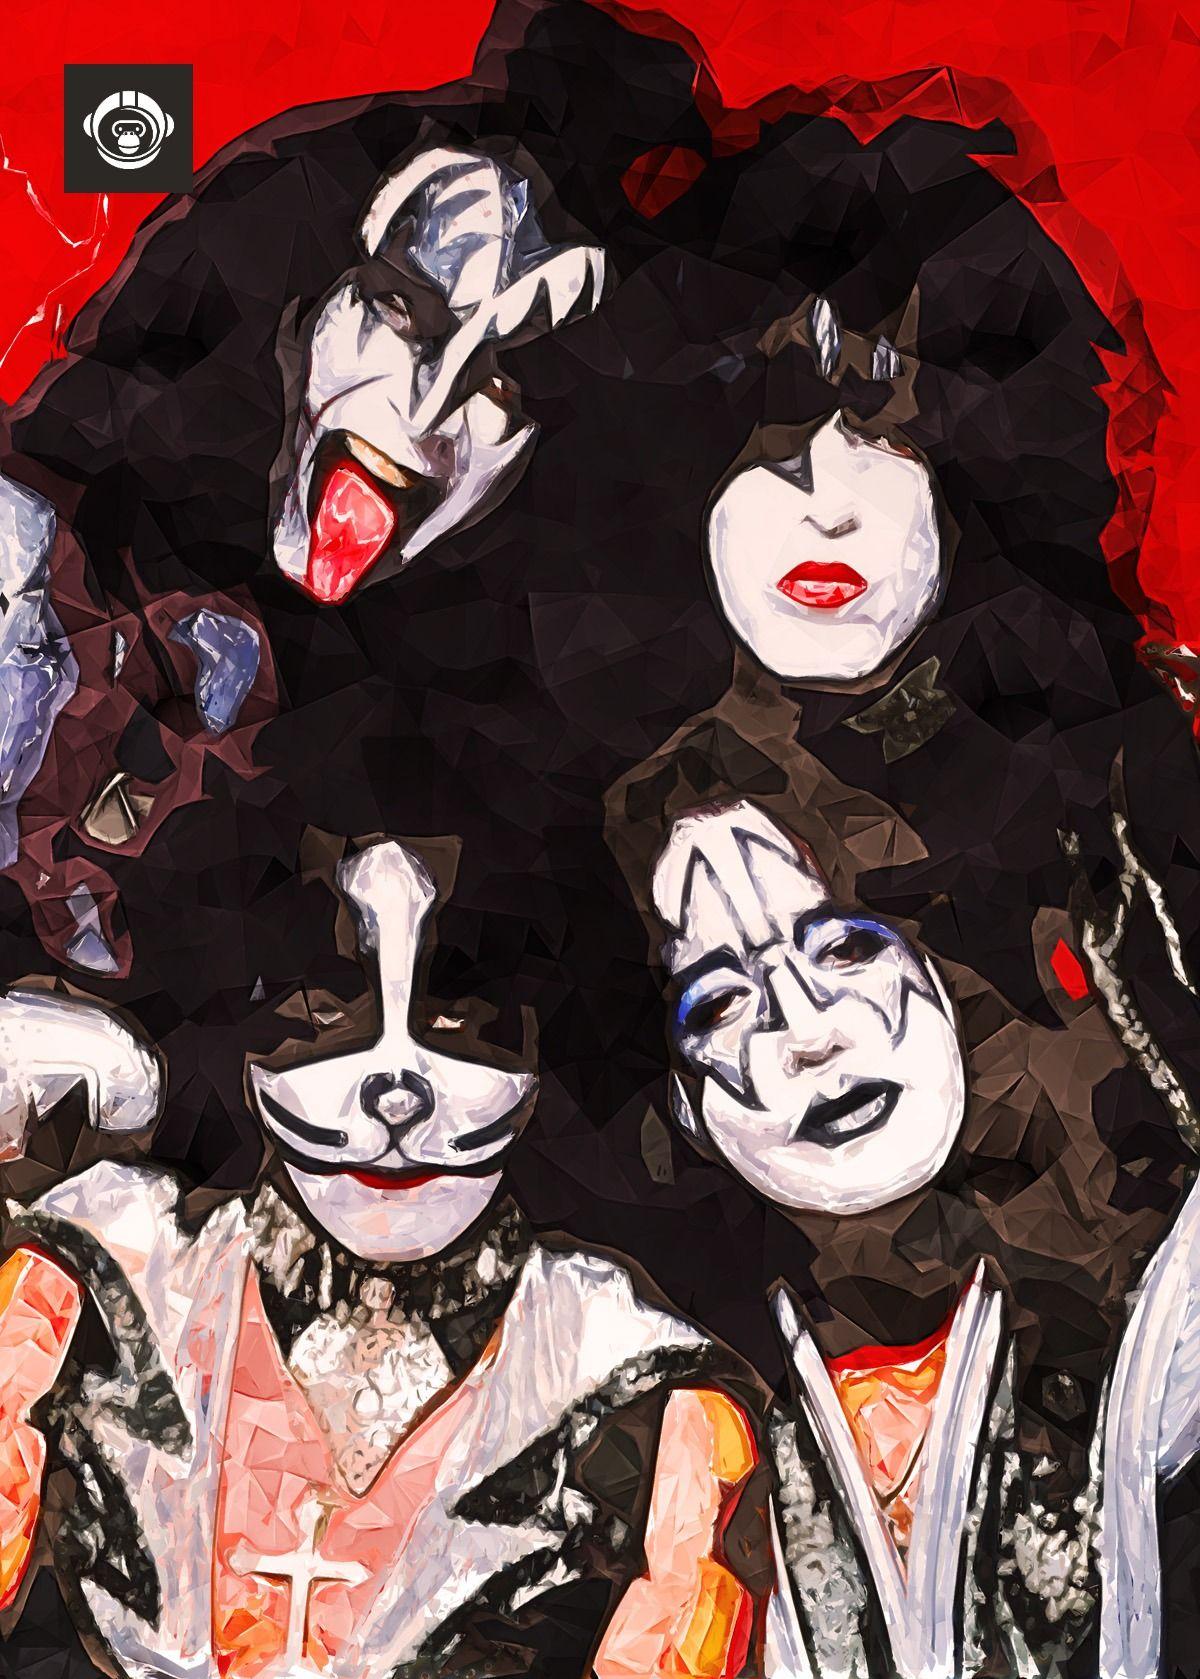 Legendary Rock N Roll Band Kiss In Digital Polygonal Painting